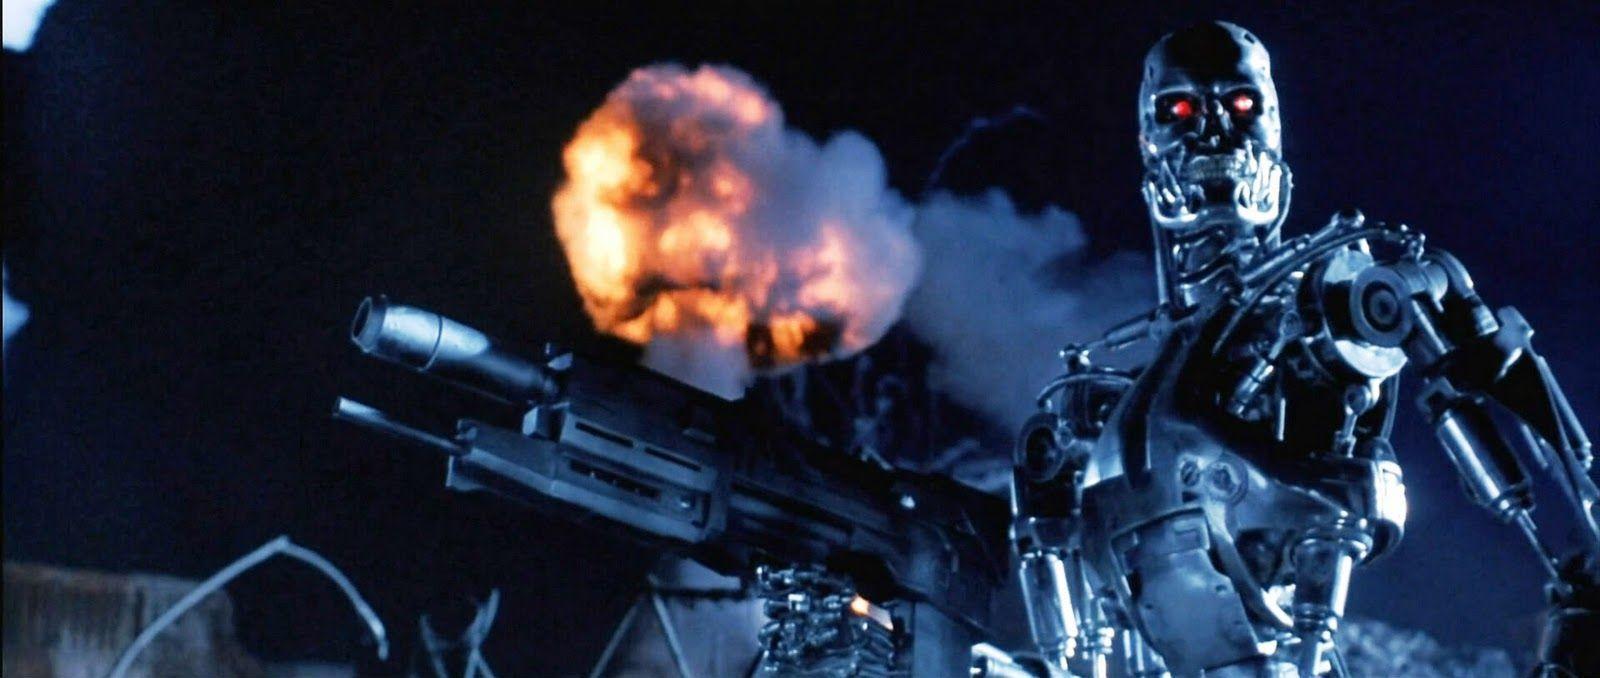 Terminator 2 wallpapers wallpaper cave - Terminator 2 wallpaper hd ...